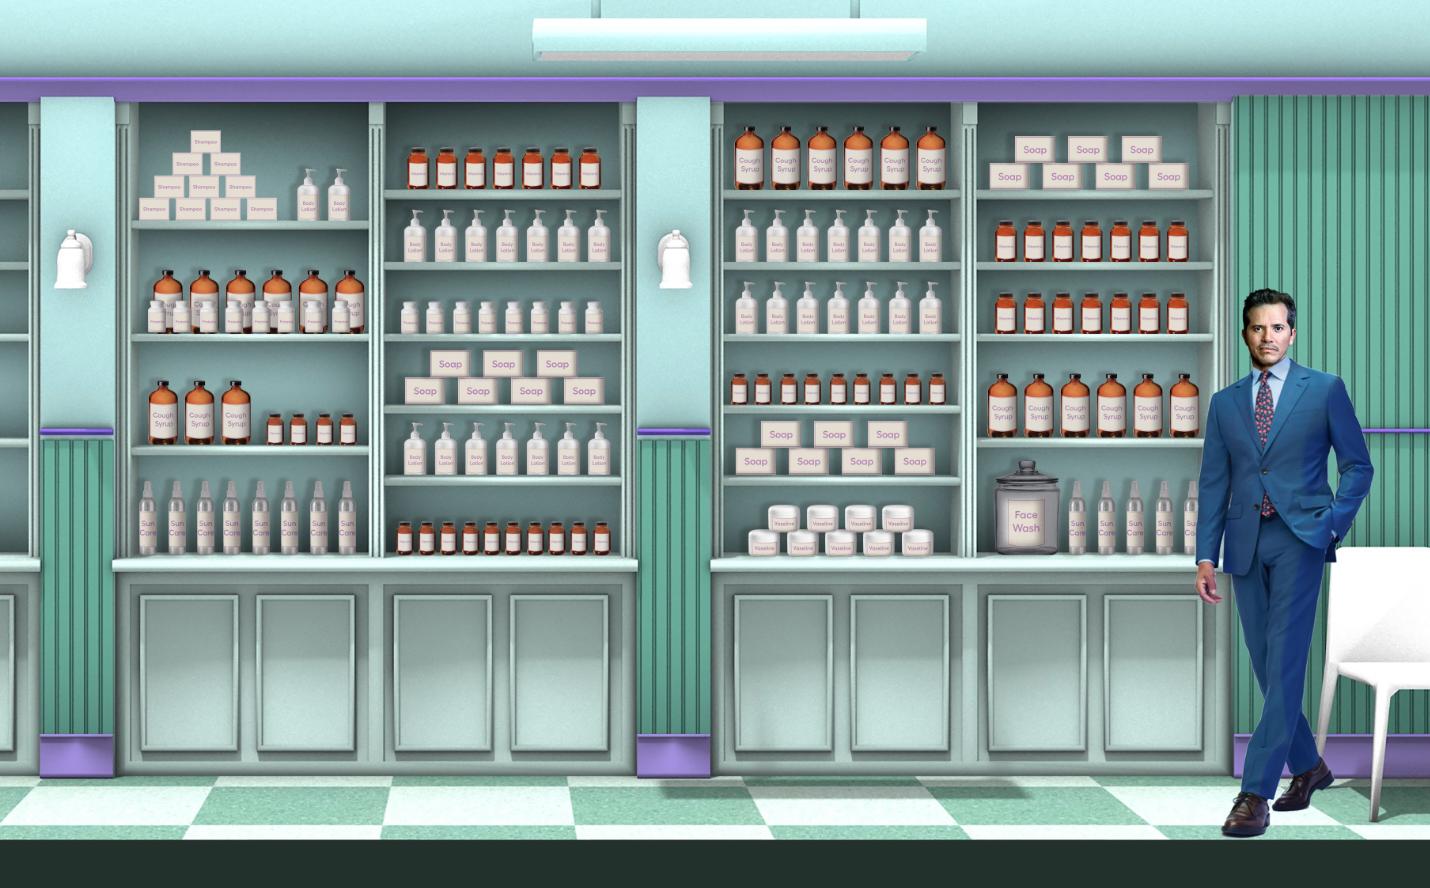 shelf layout